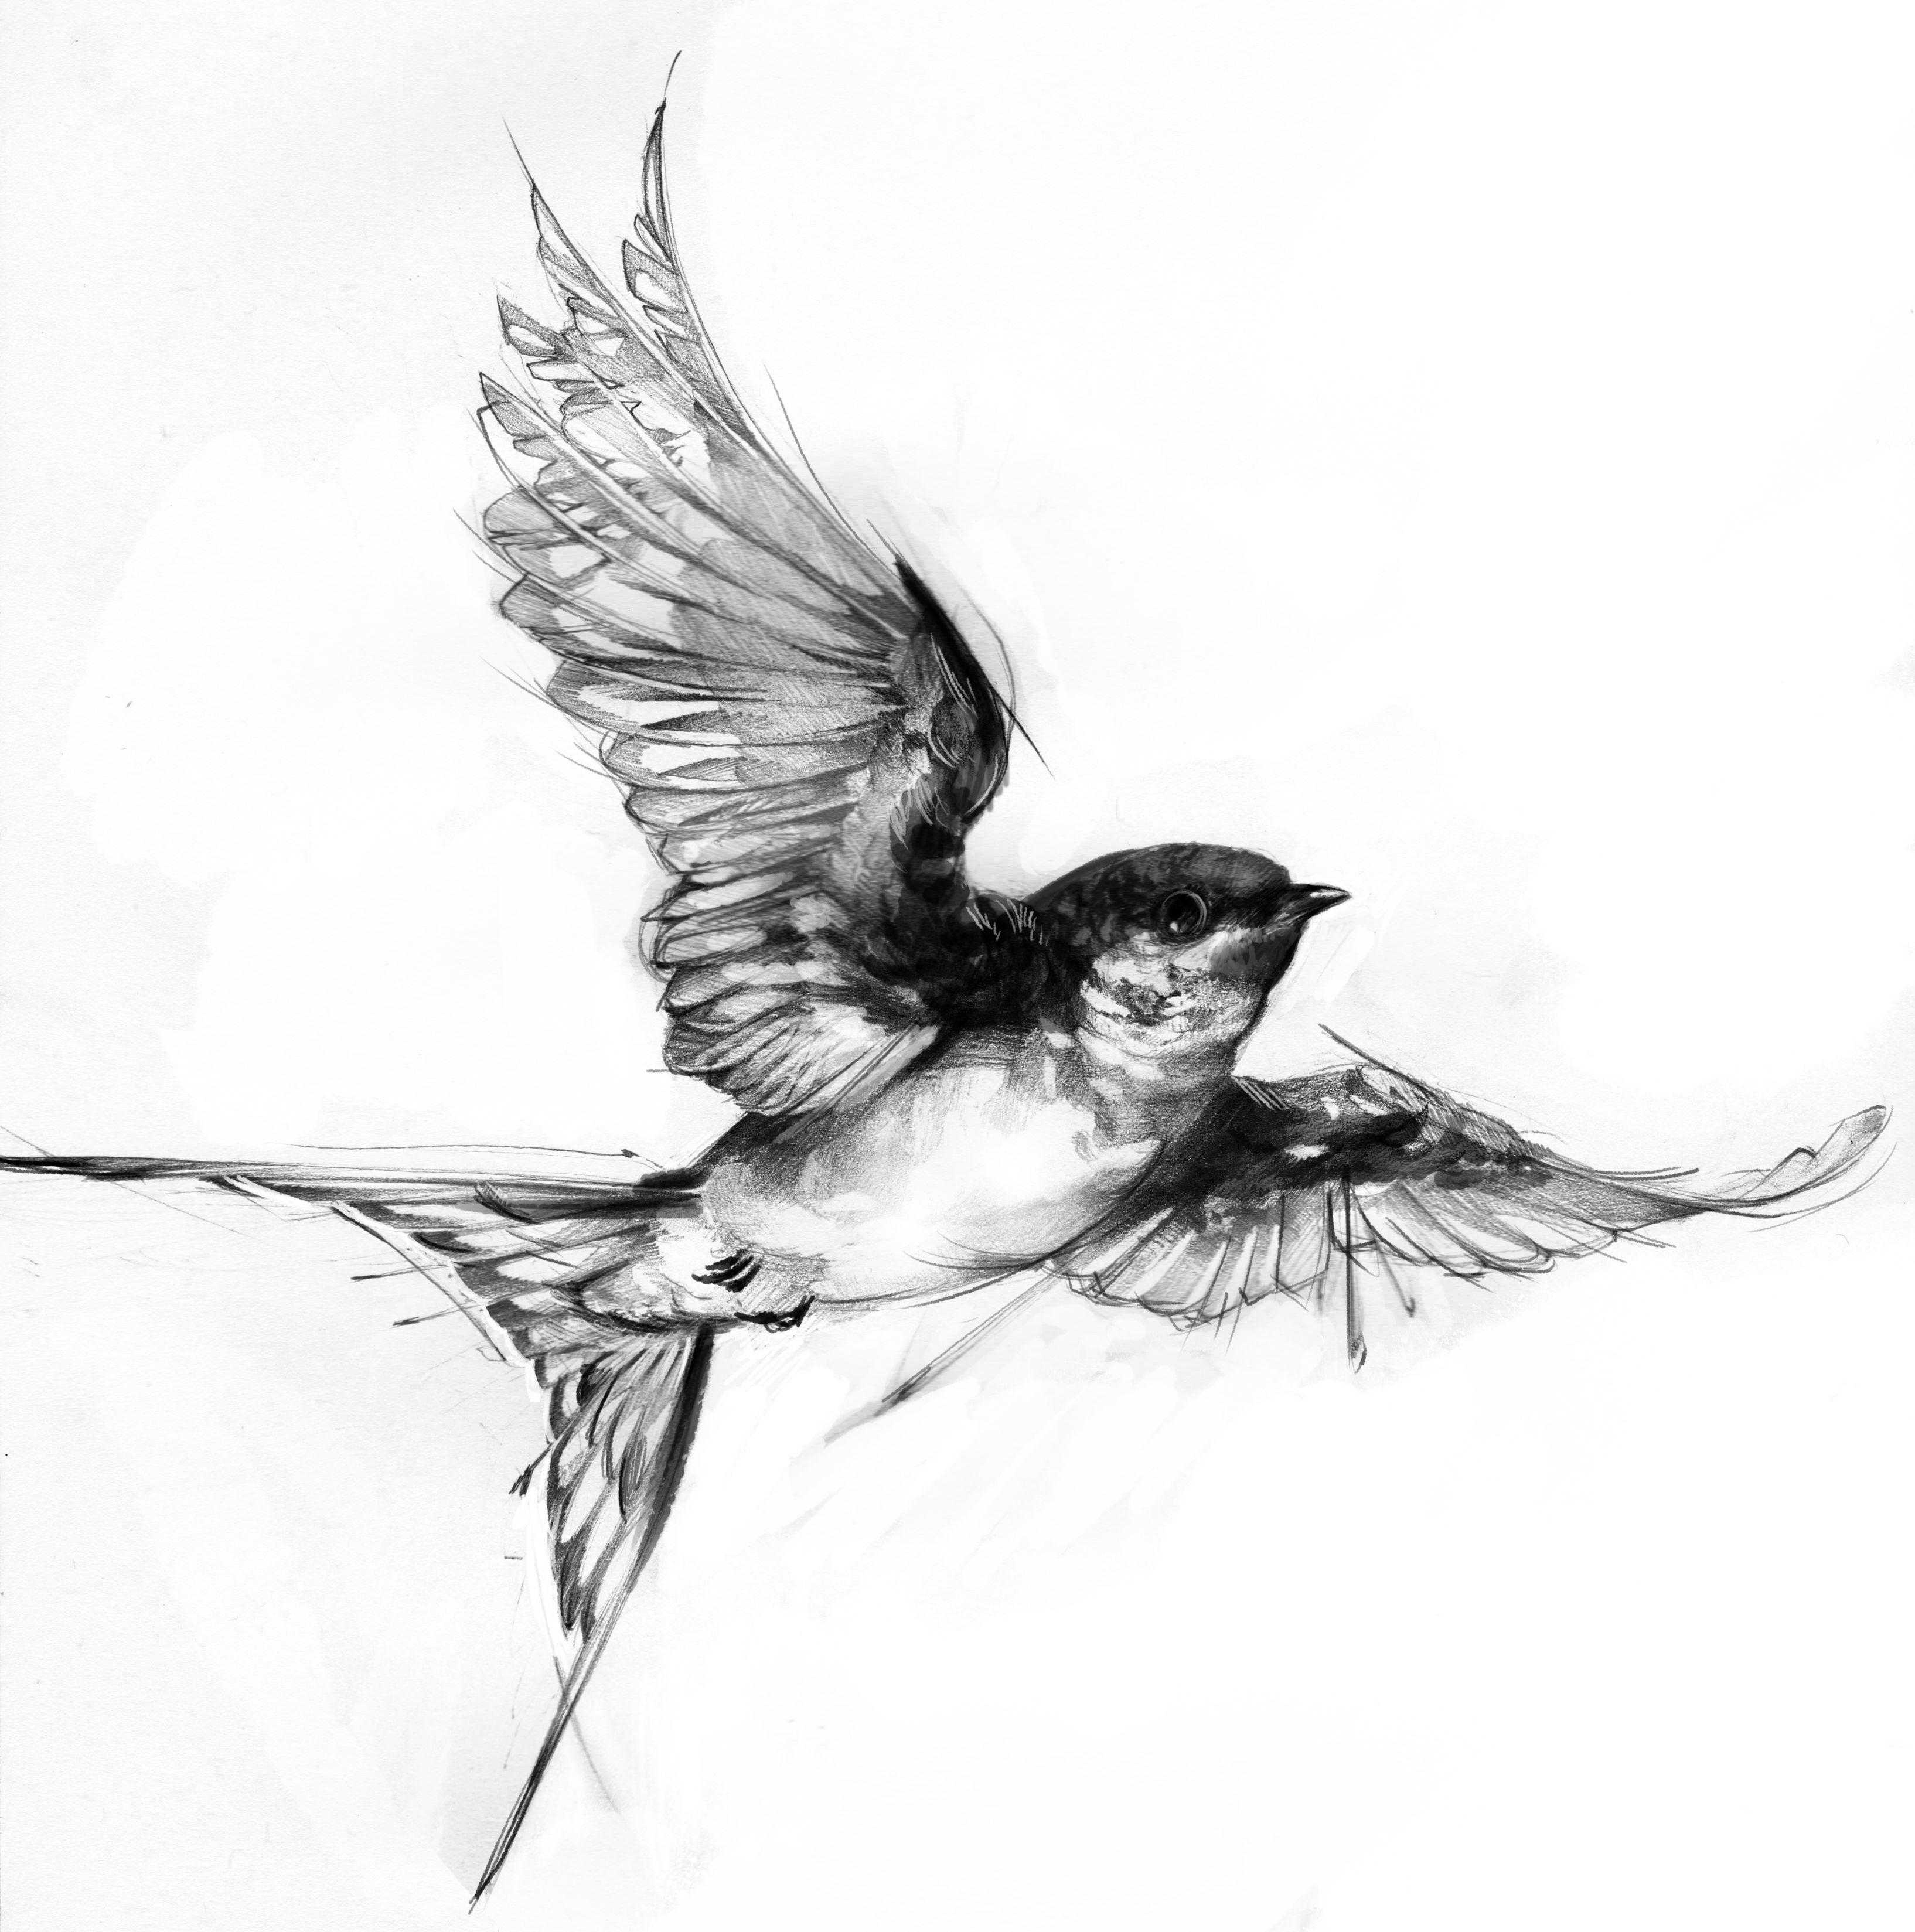 Beautiful, can be a tattoo | Bird tattoos arm, Swallow